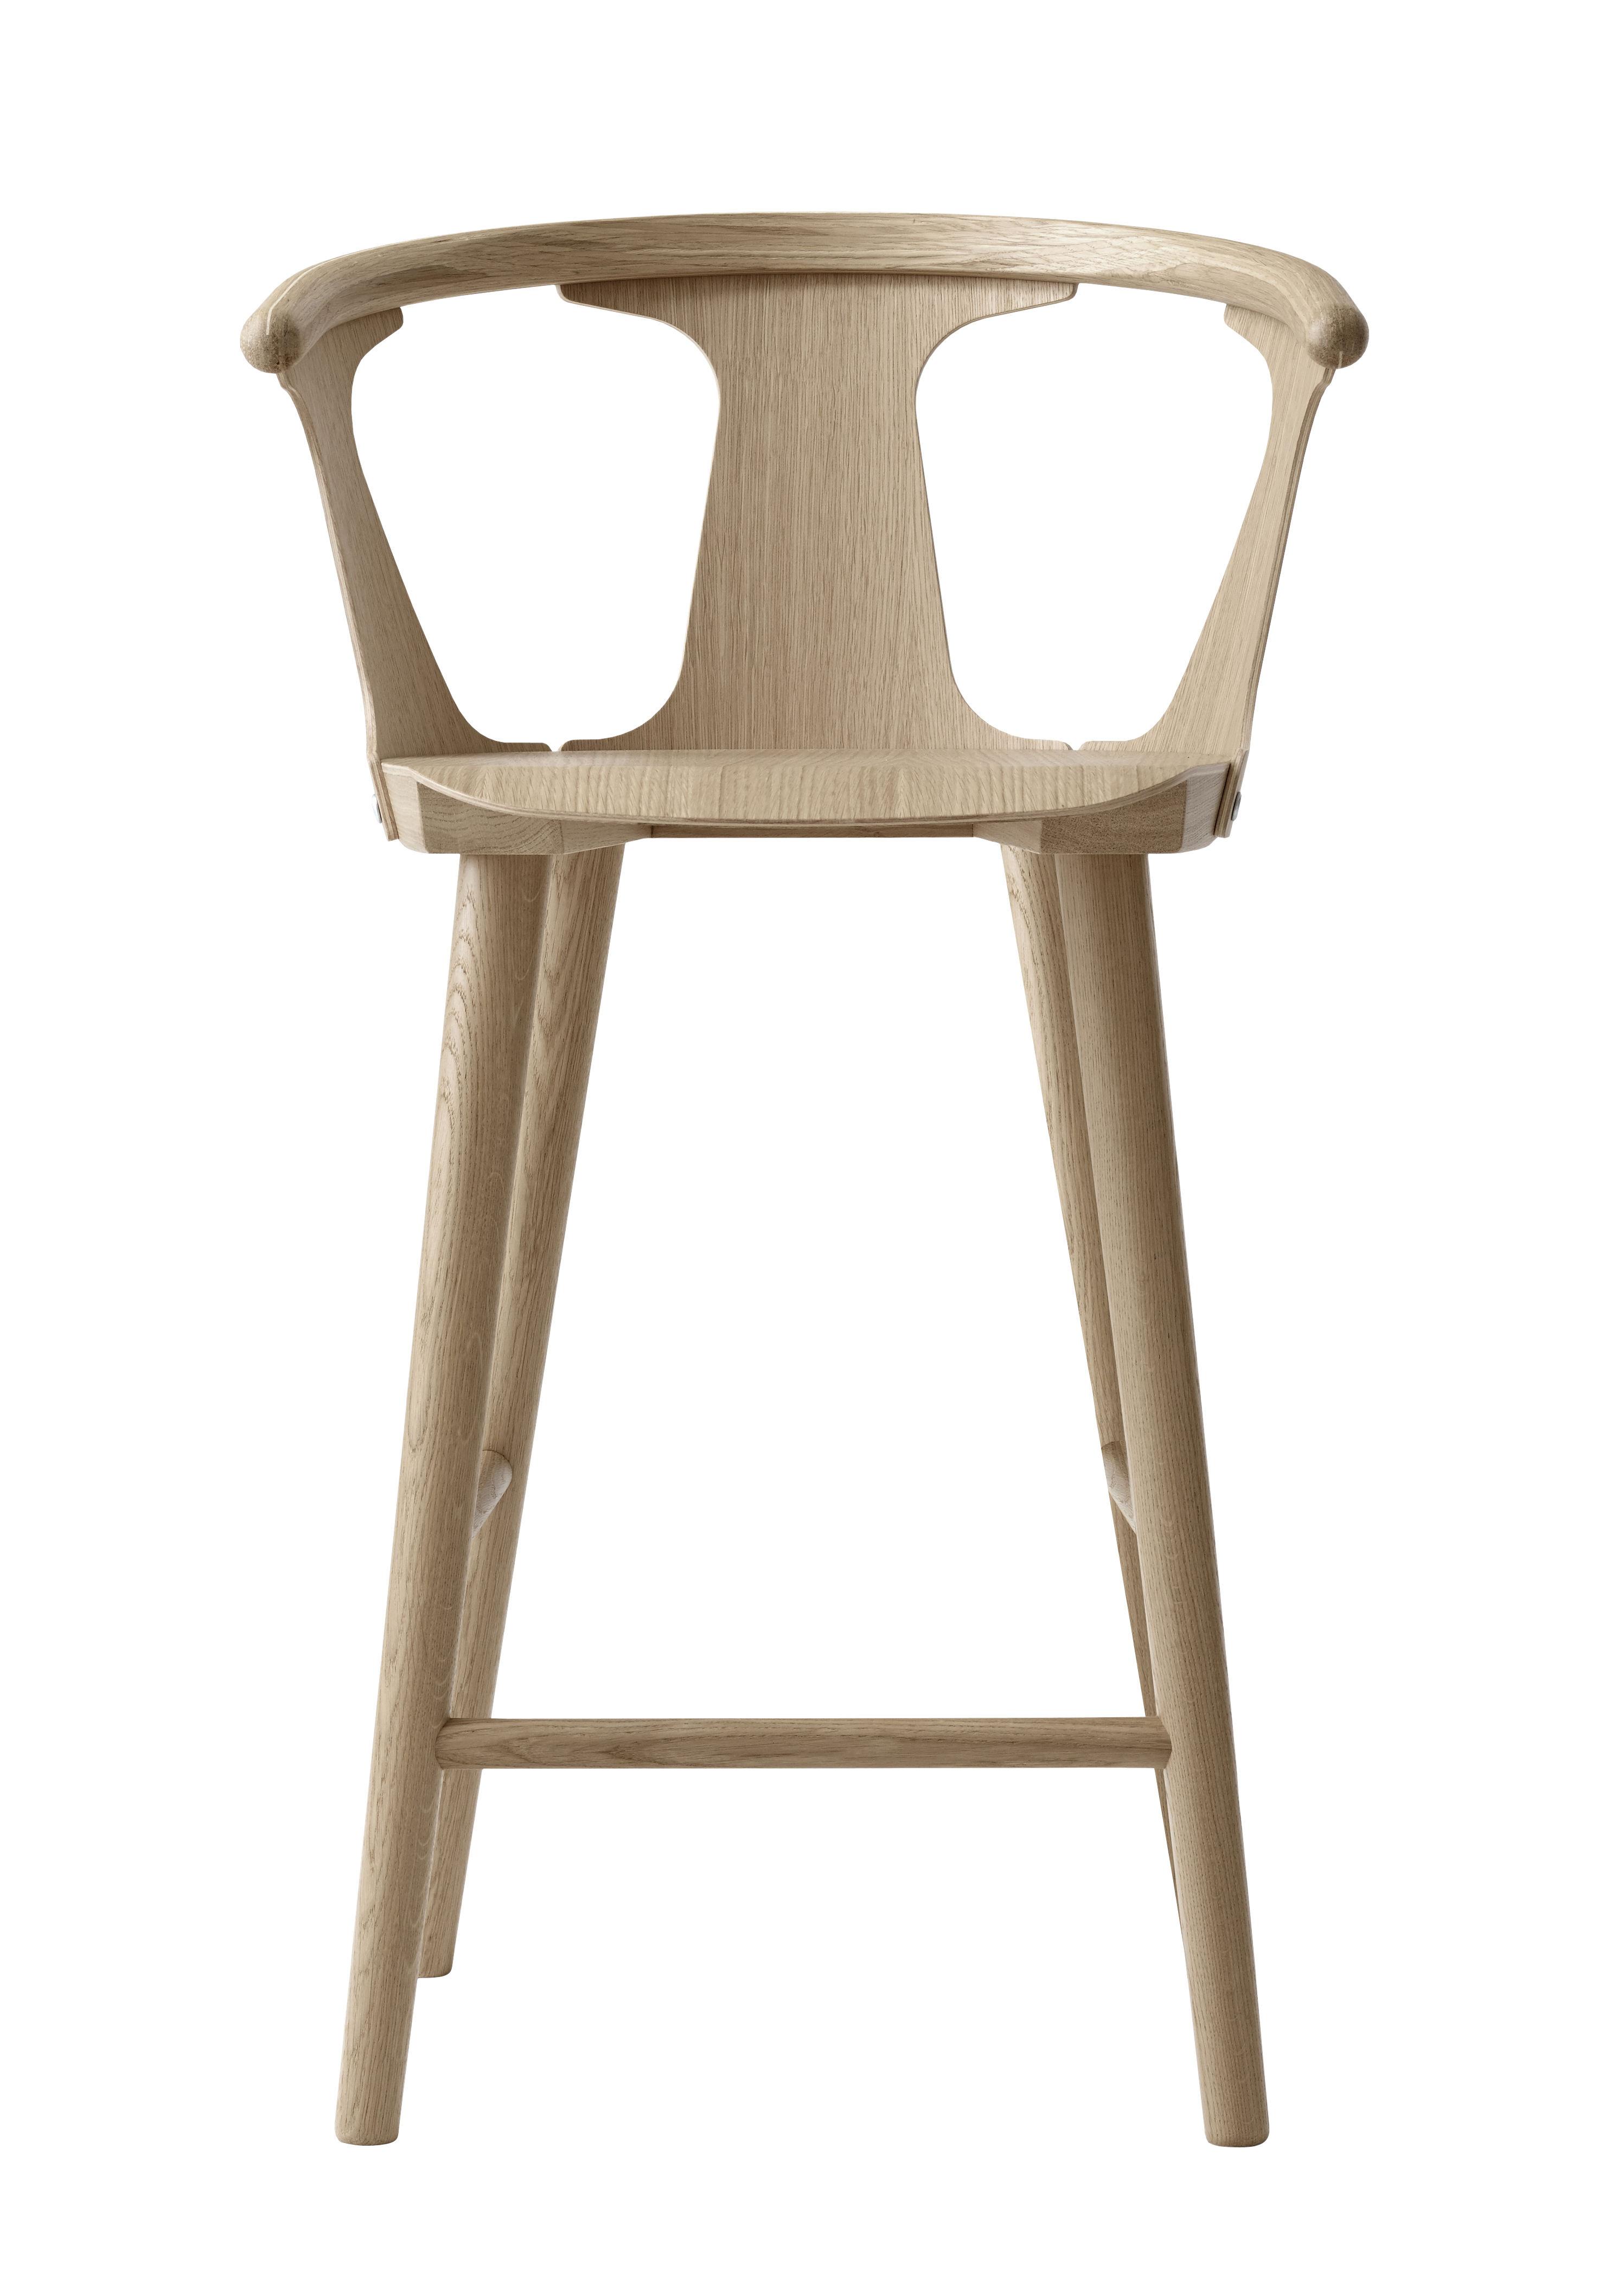 Mobilier - Tabourets de bar - Chaise de bar In Between SK7 / H 65 cm - Chêne - &tradition - Chêne blanchi - Chêne massif, Placage de chêne